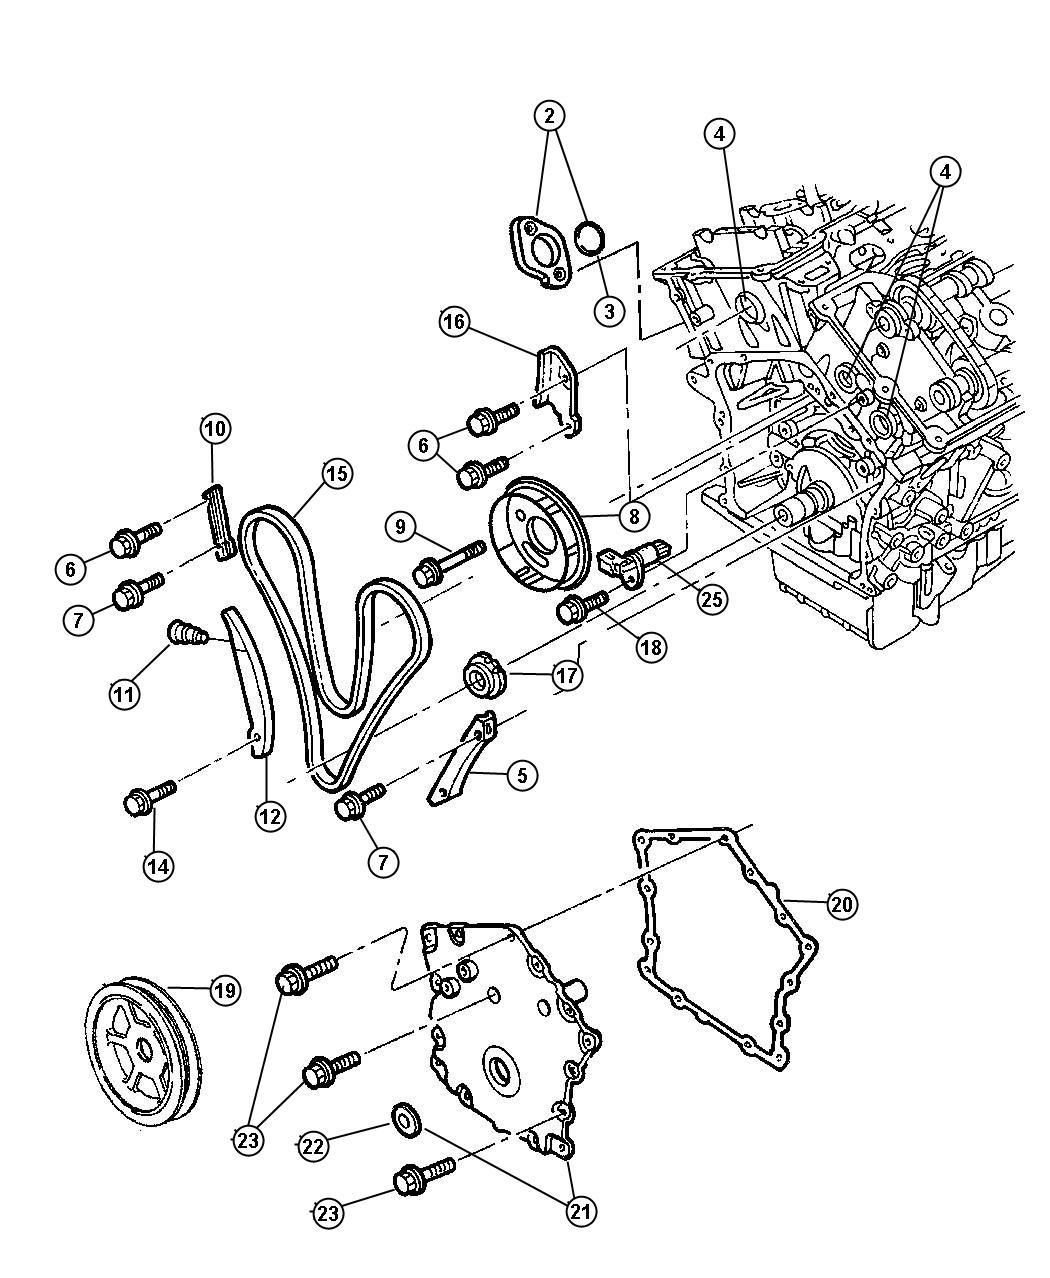 Chrysler 300 Cap Tensioner Primary Pincludes Ees Eee